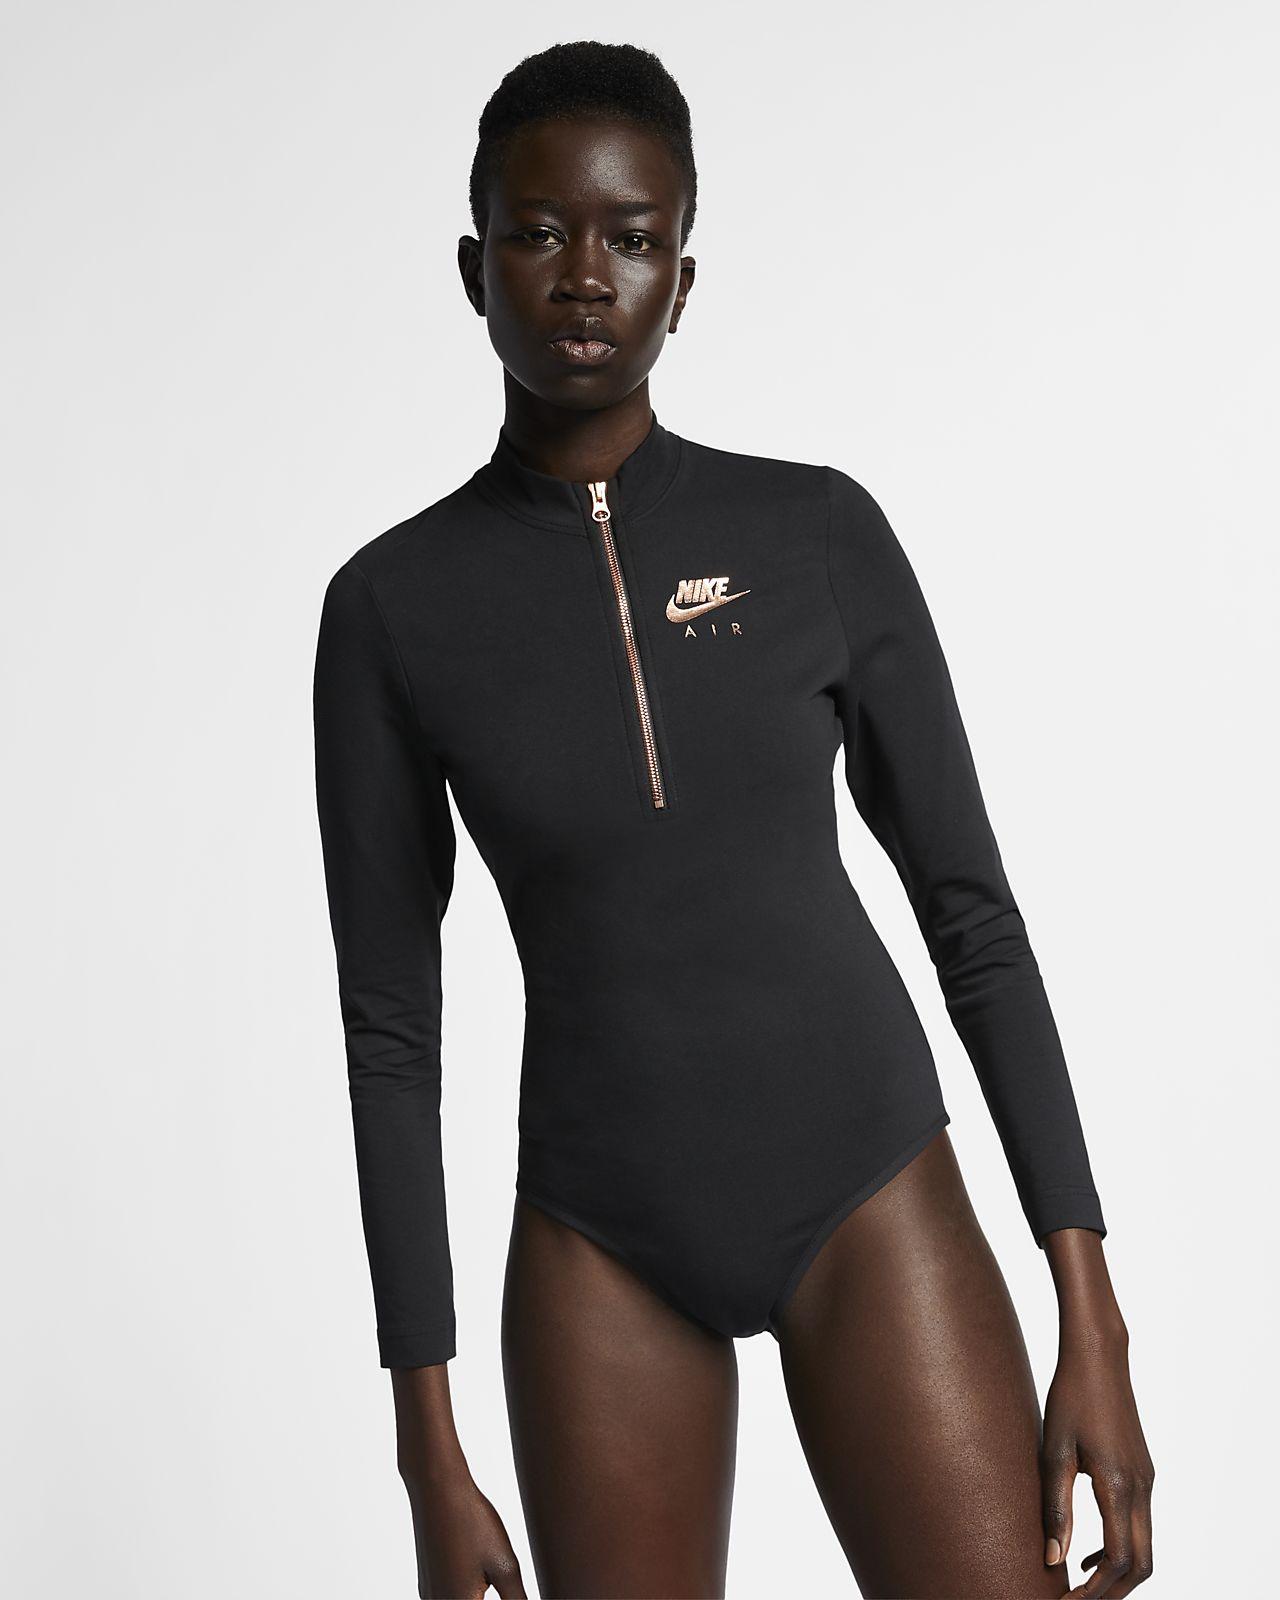 Nike Air Women's Long-Sleeve Metallic Bodysuit